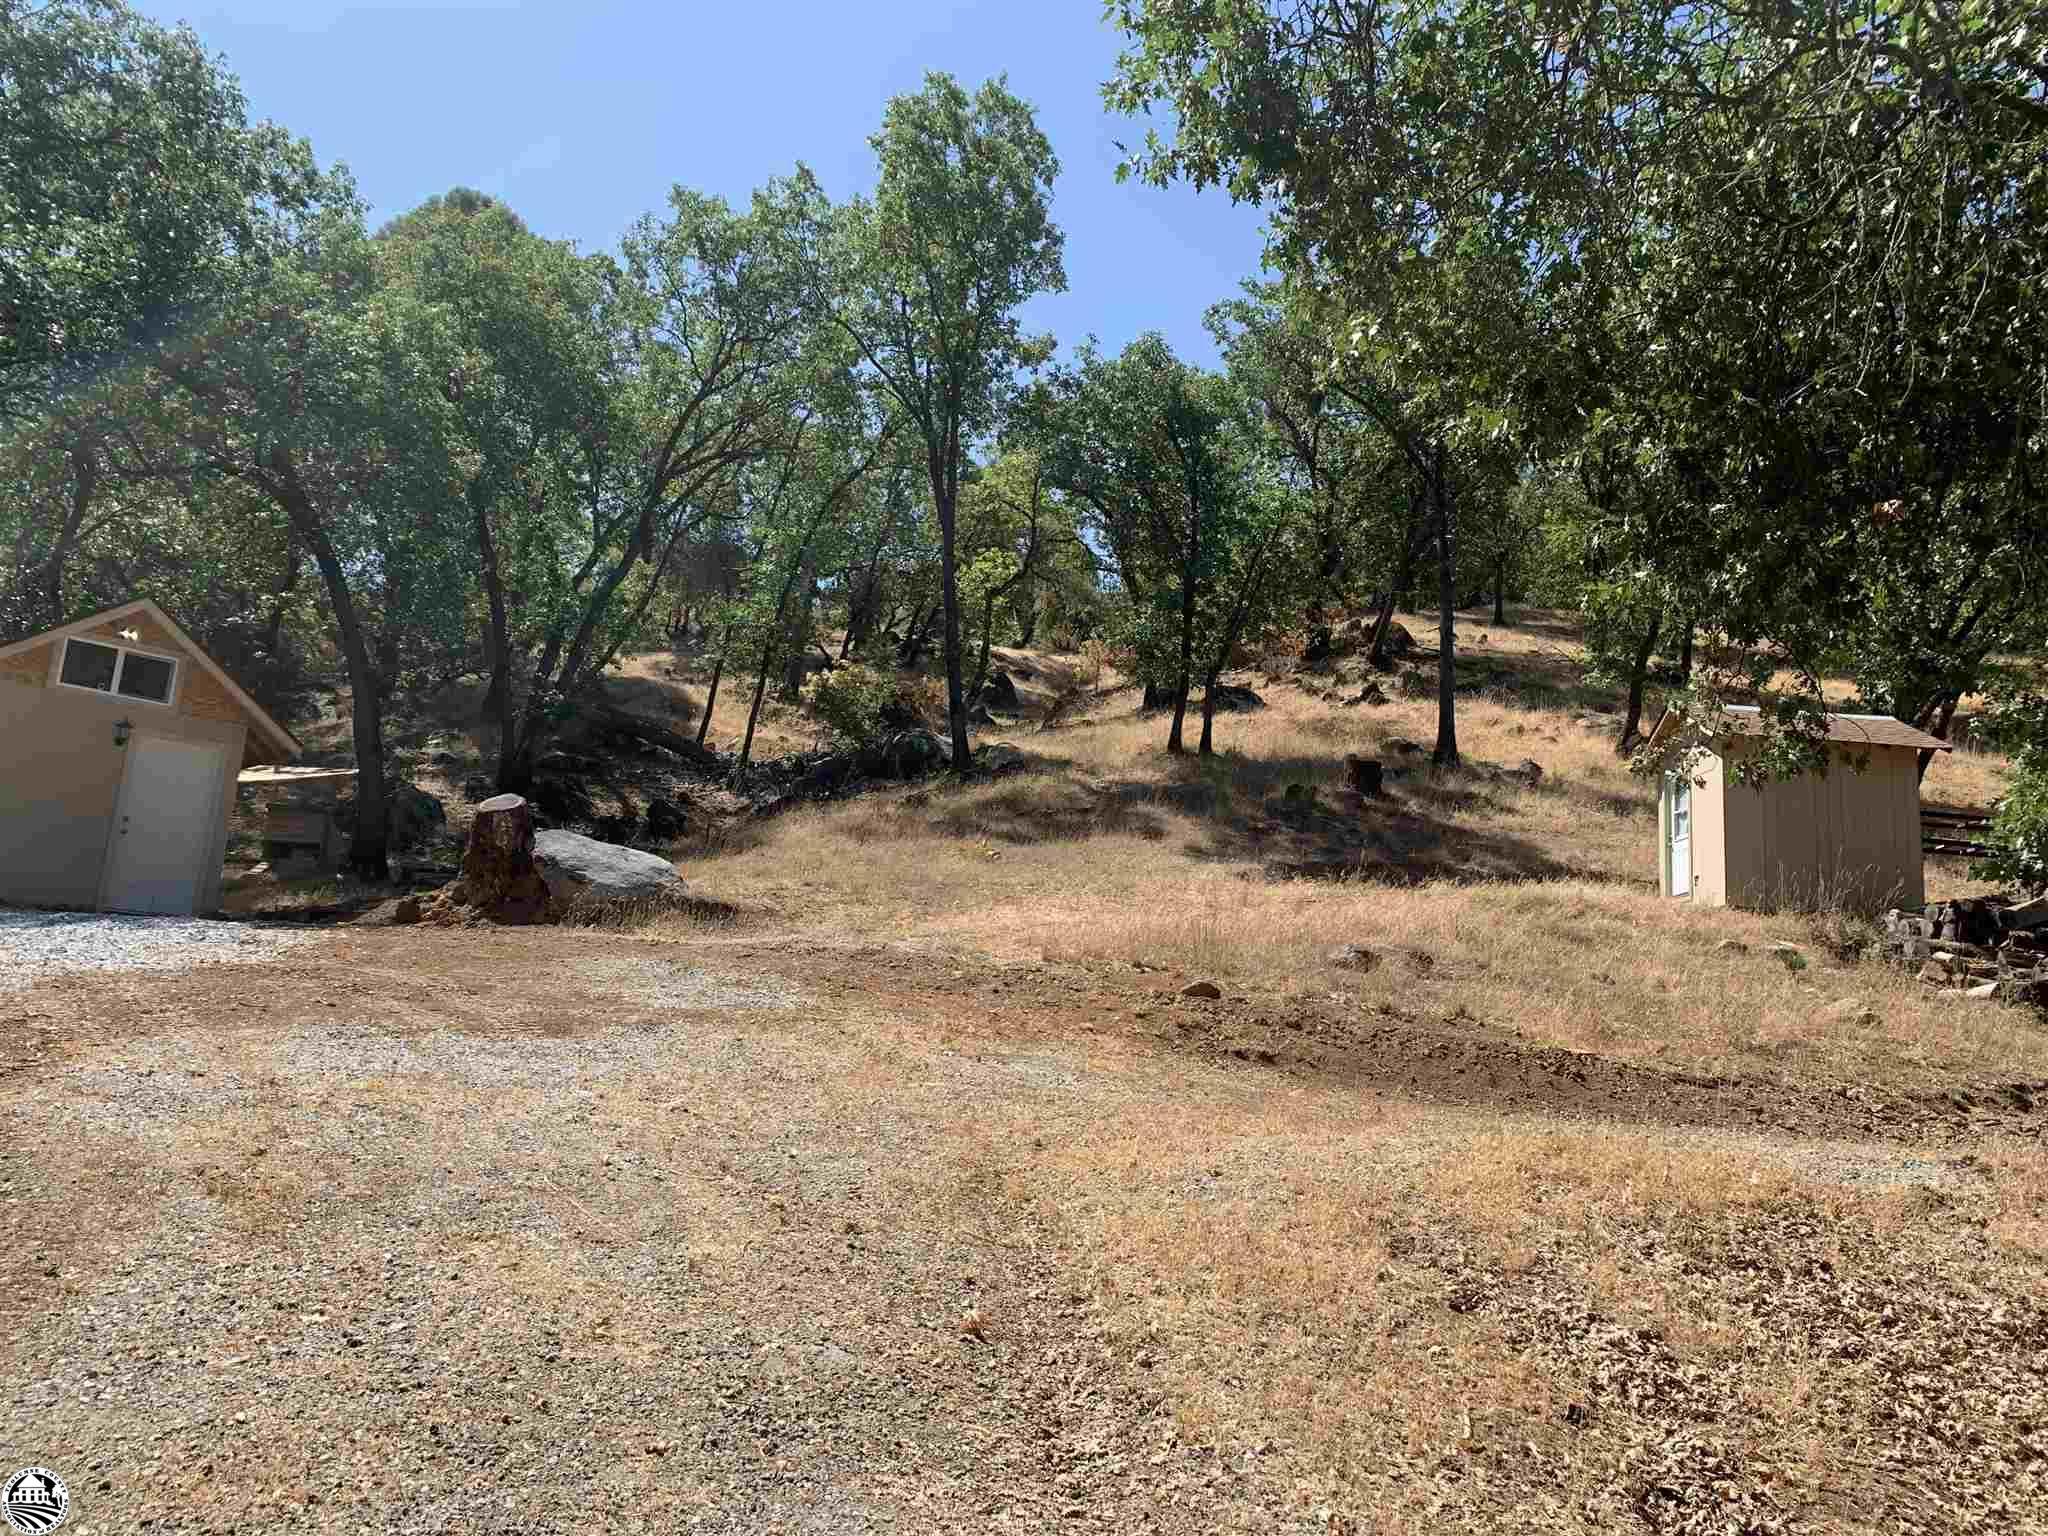 16115 Hidden Valley Rd, Sonora, CA 95370